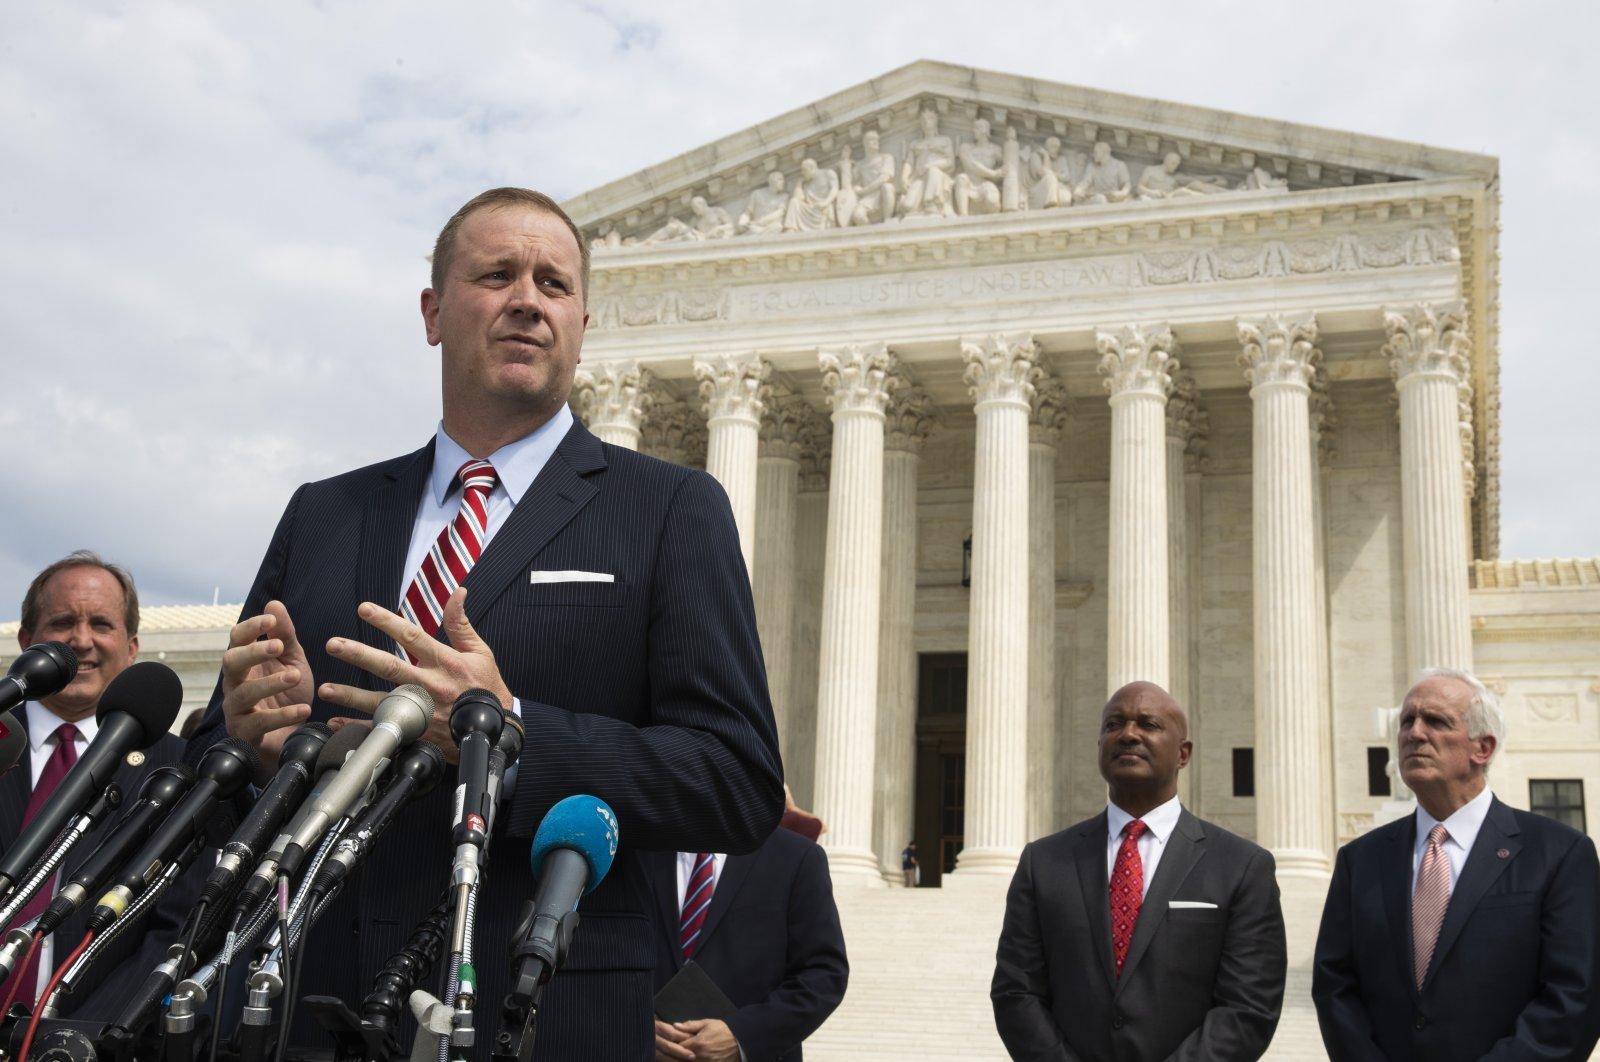 Missouri Attorney General Eric Schmitt speaks in front of the U.S. Supreme Court in Washington D.C., U.S., Sept. 9, 2019. (AP Photo)